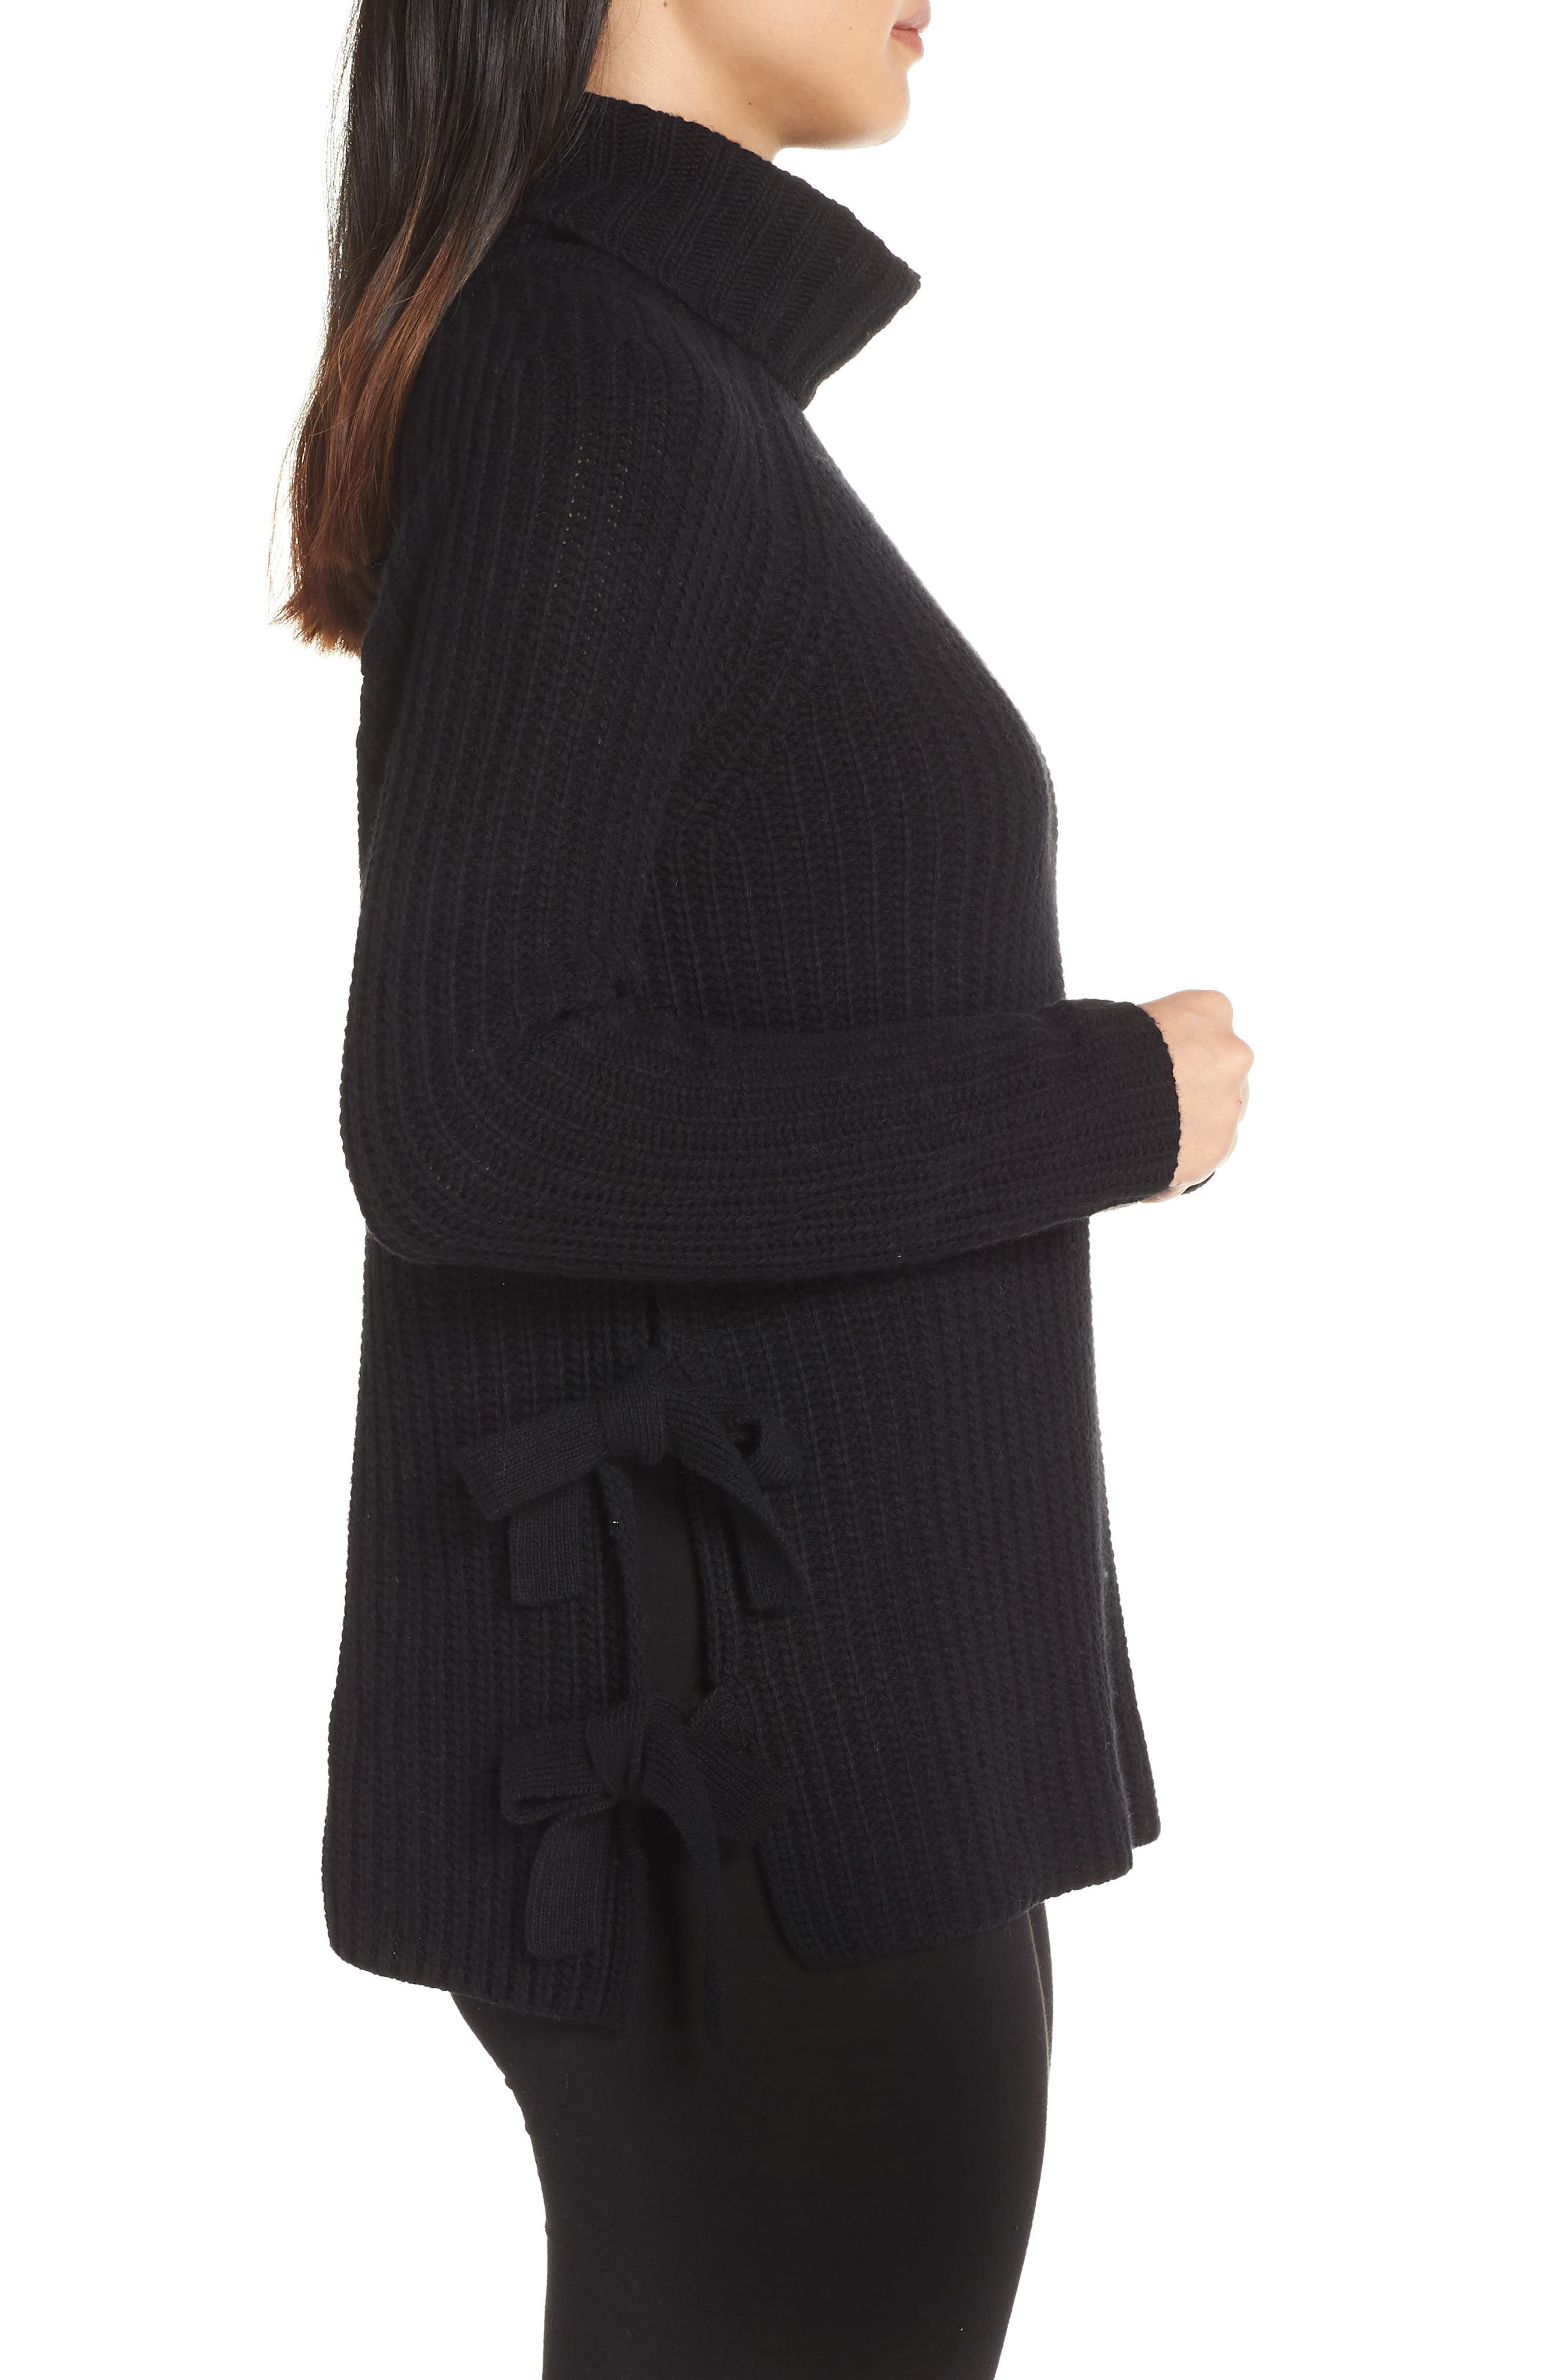 Ceanne Turtleneck Sweater,                             Alternate thumbnail 3, color,                             001